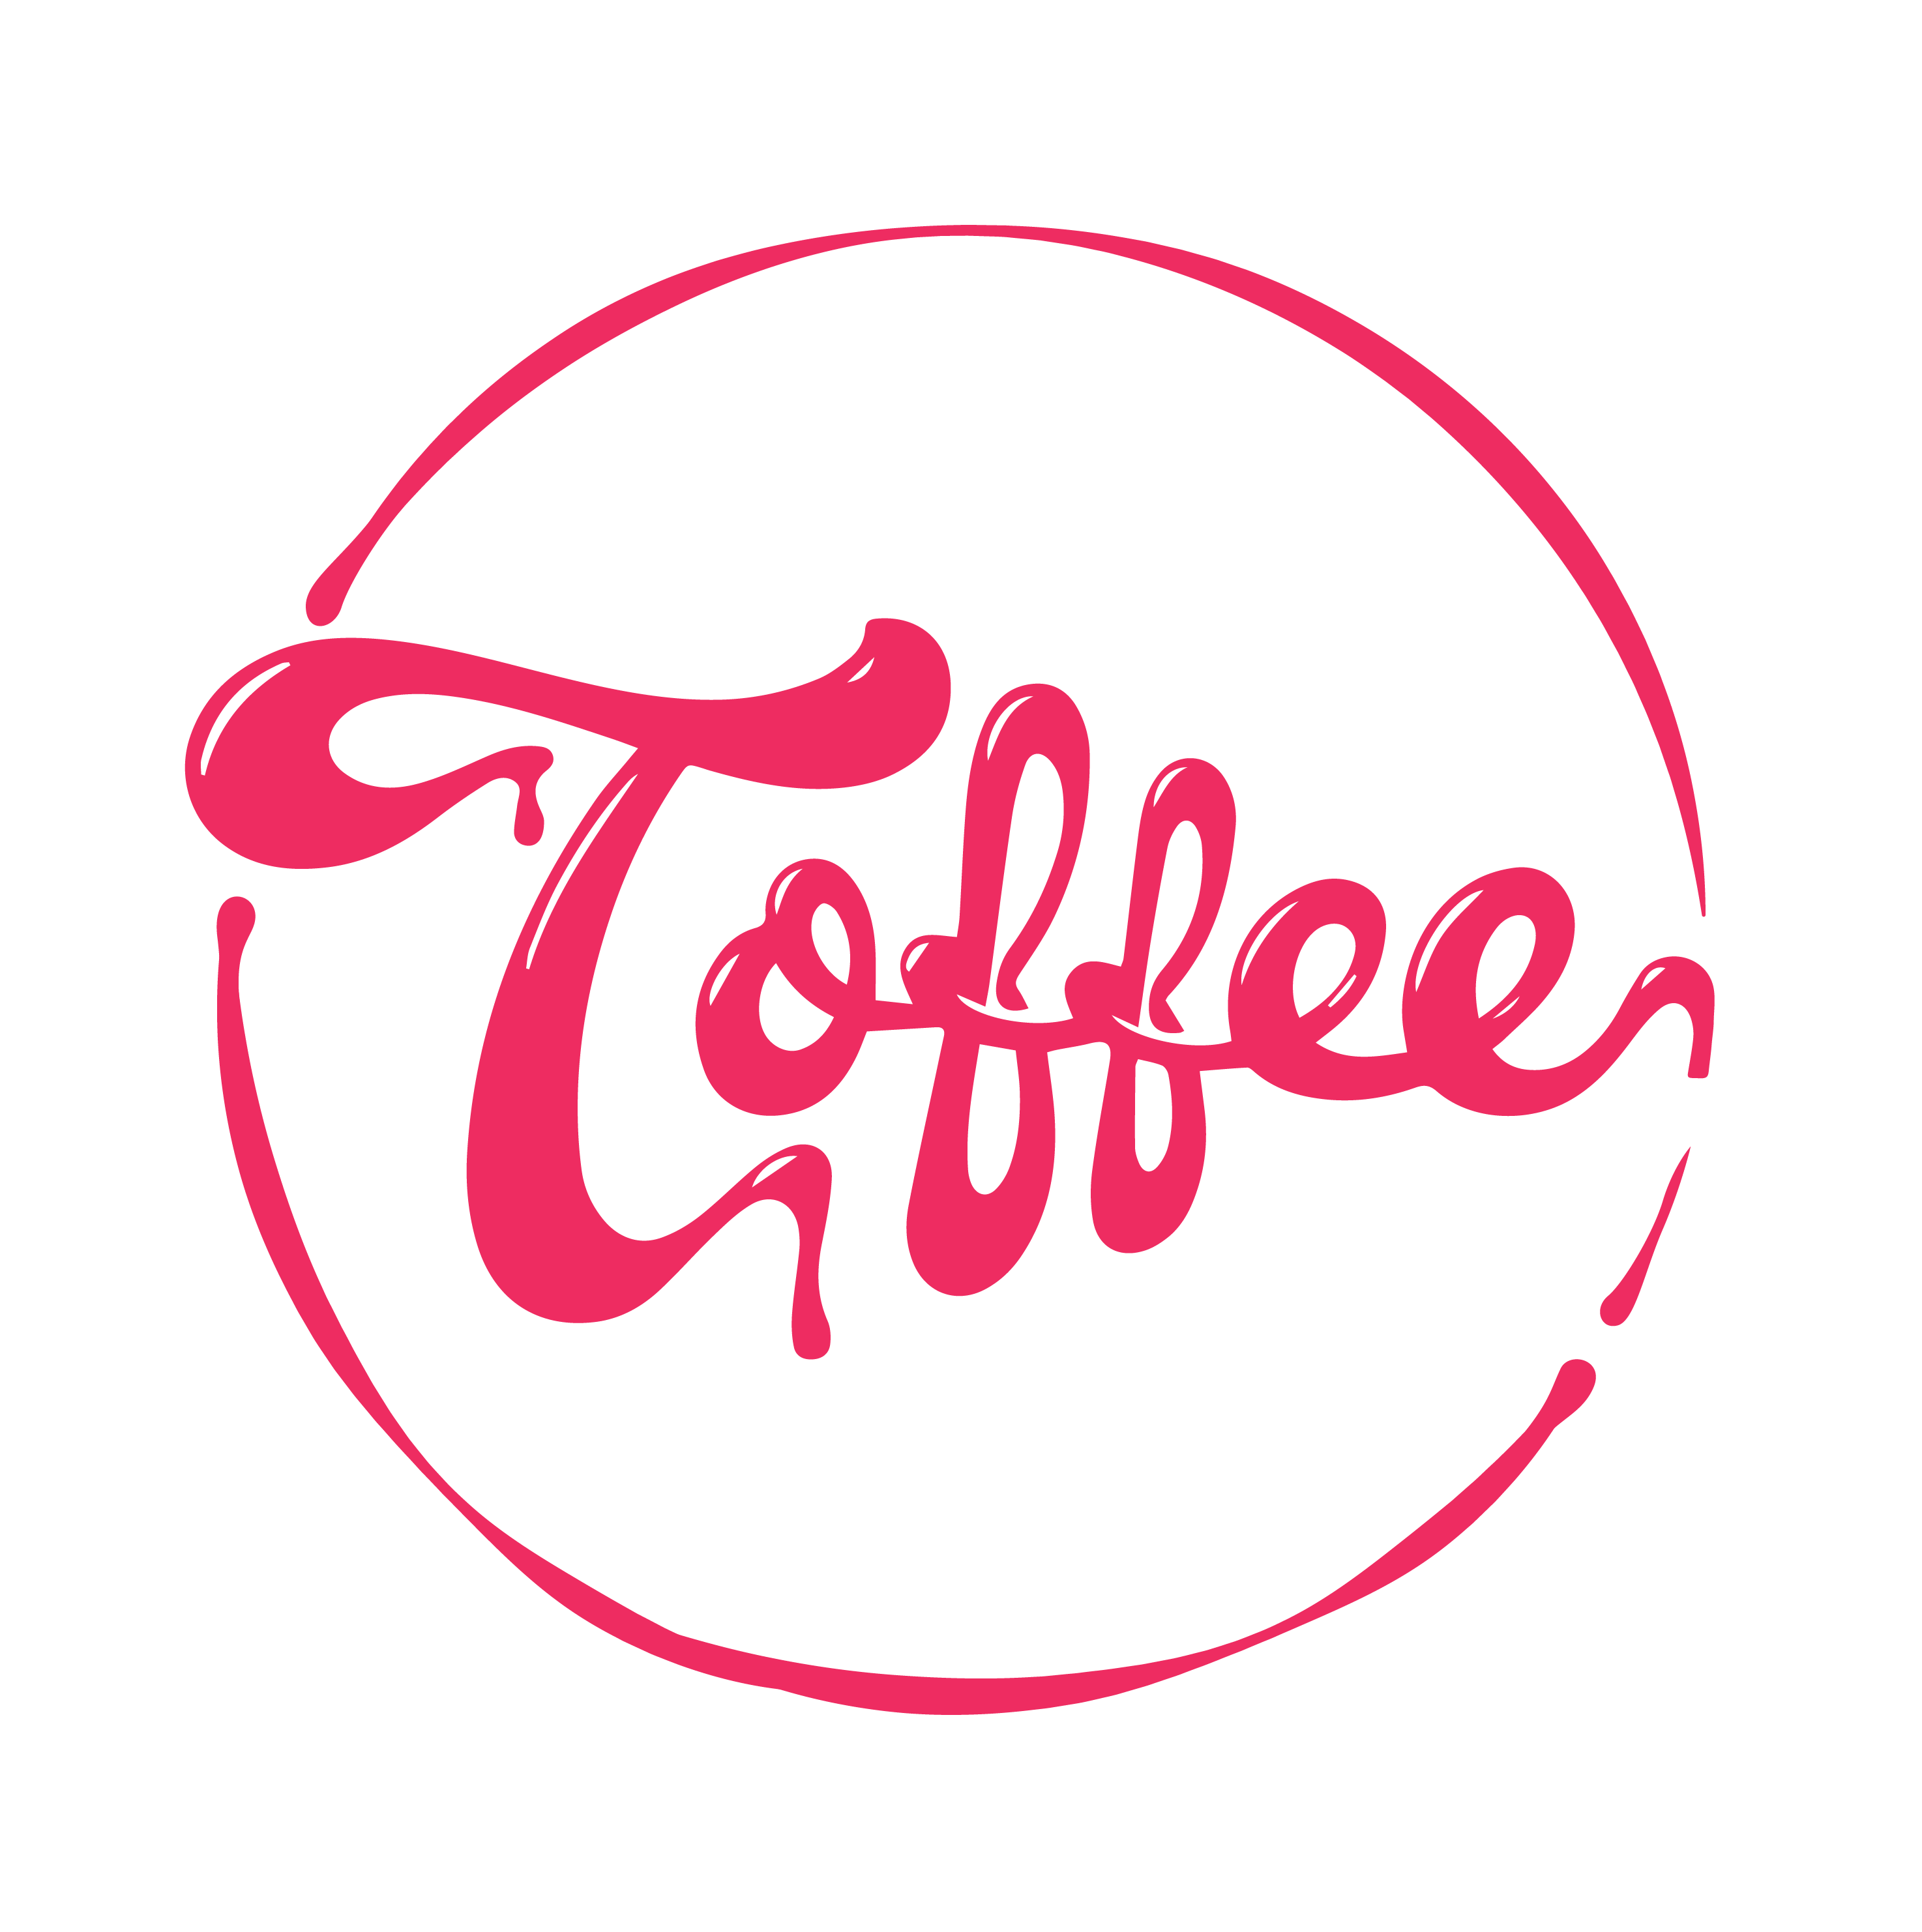 toffee-logo-plain